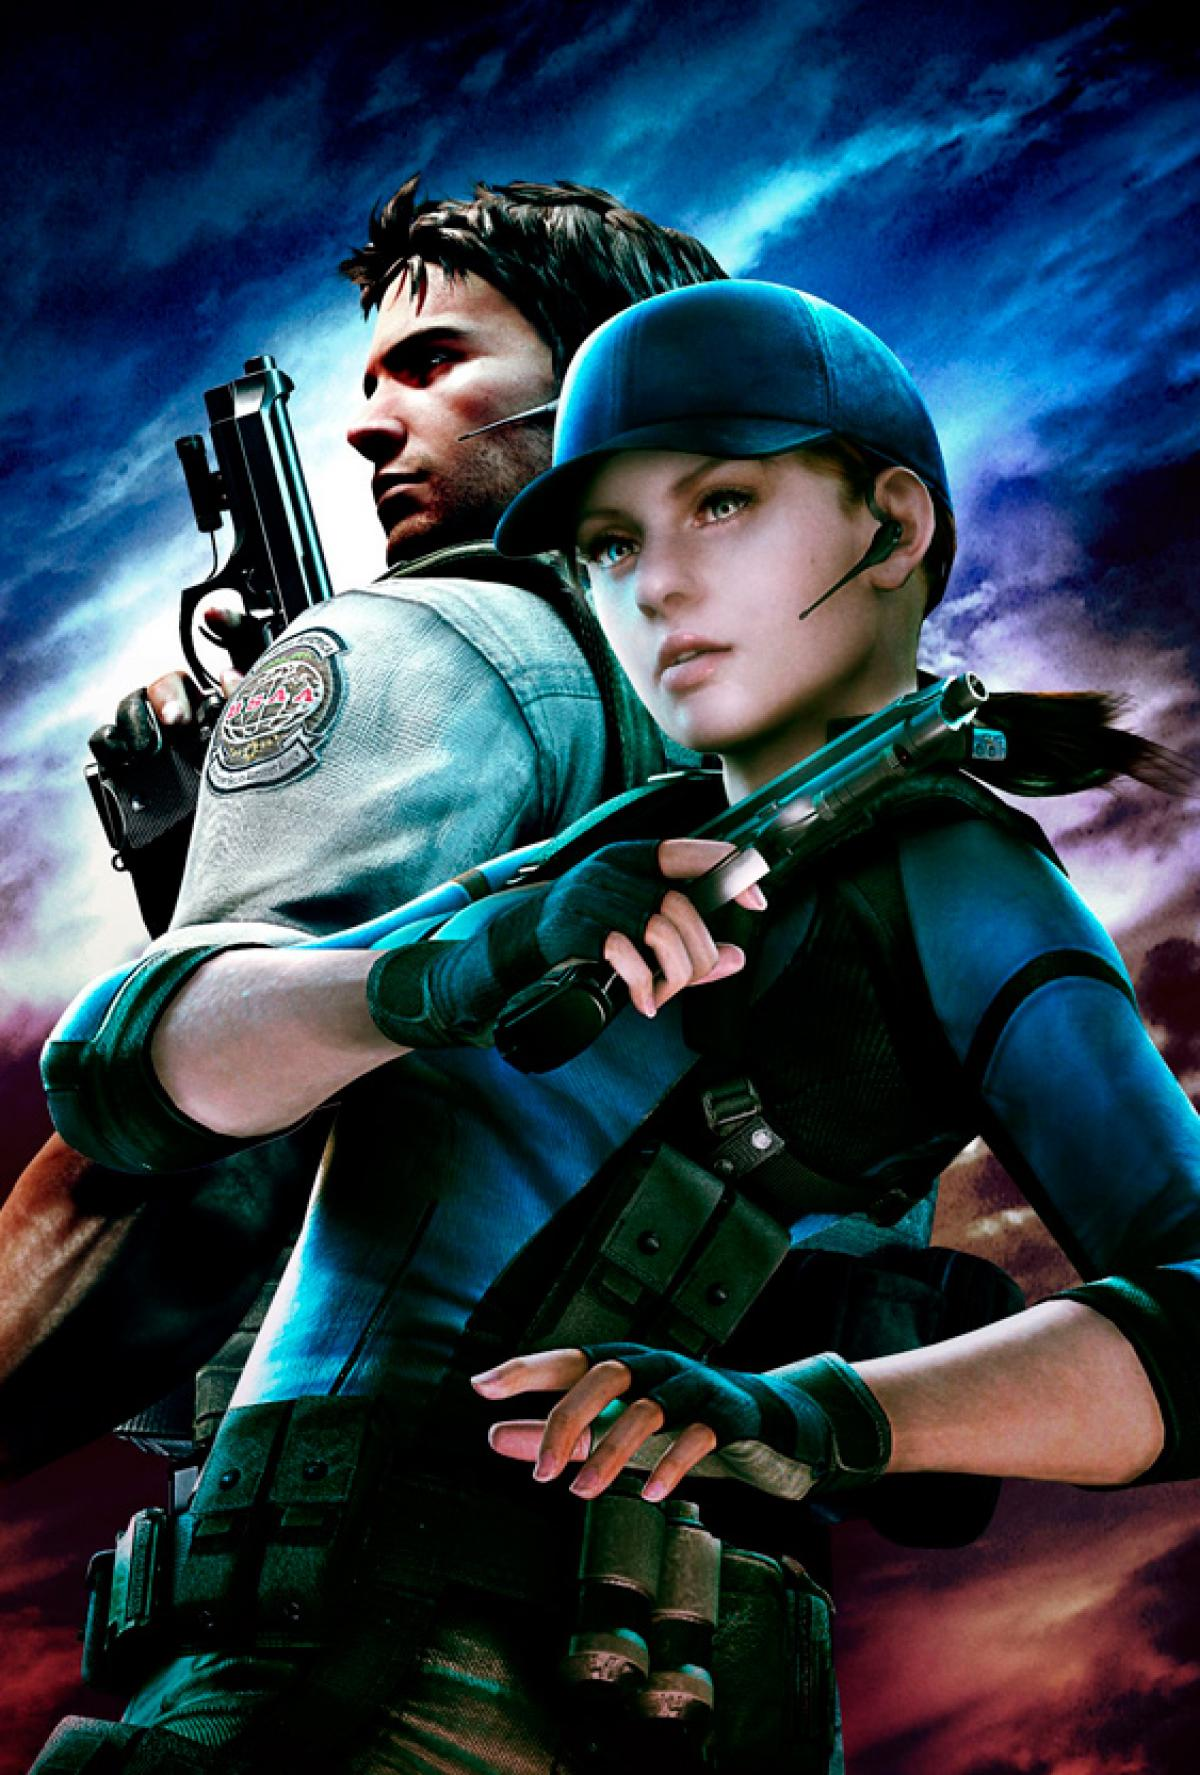 Resident Evil 5 Pc Ps3 Ps4 Xbox 360 Xbox One Hobbyconsolas